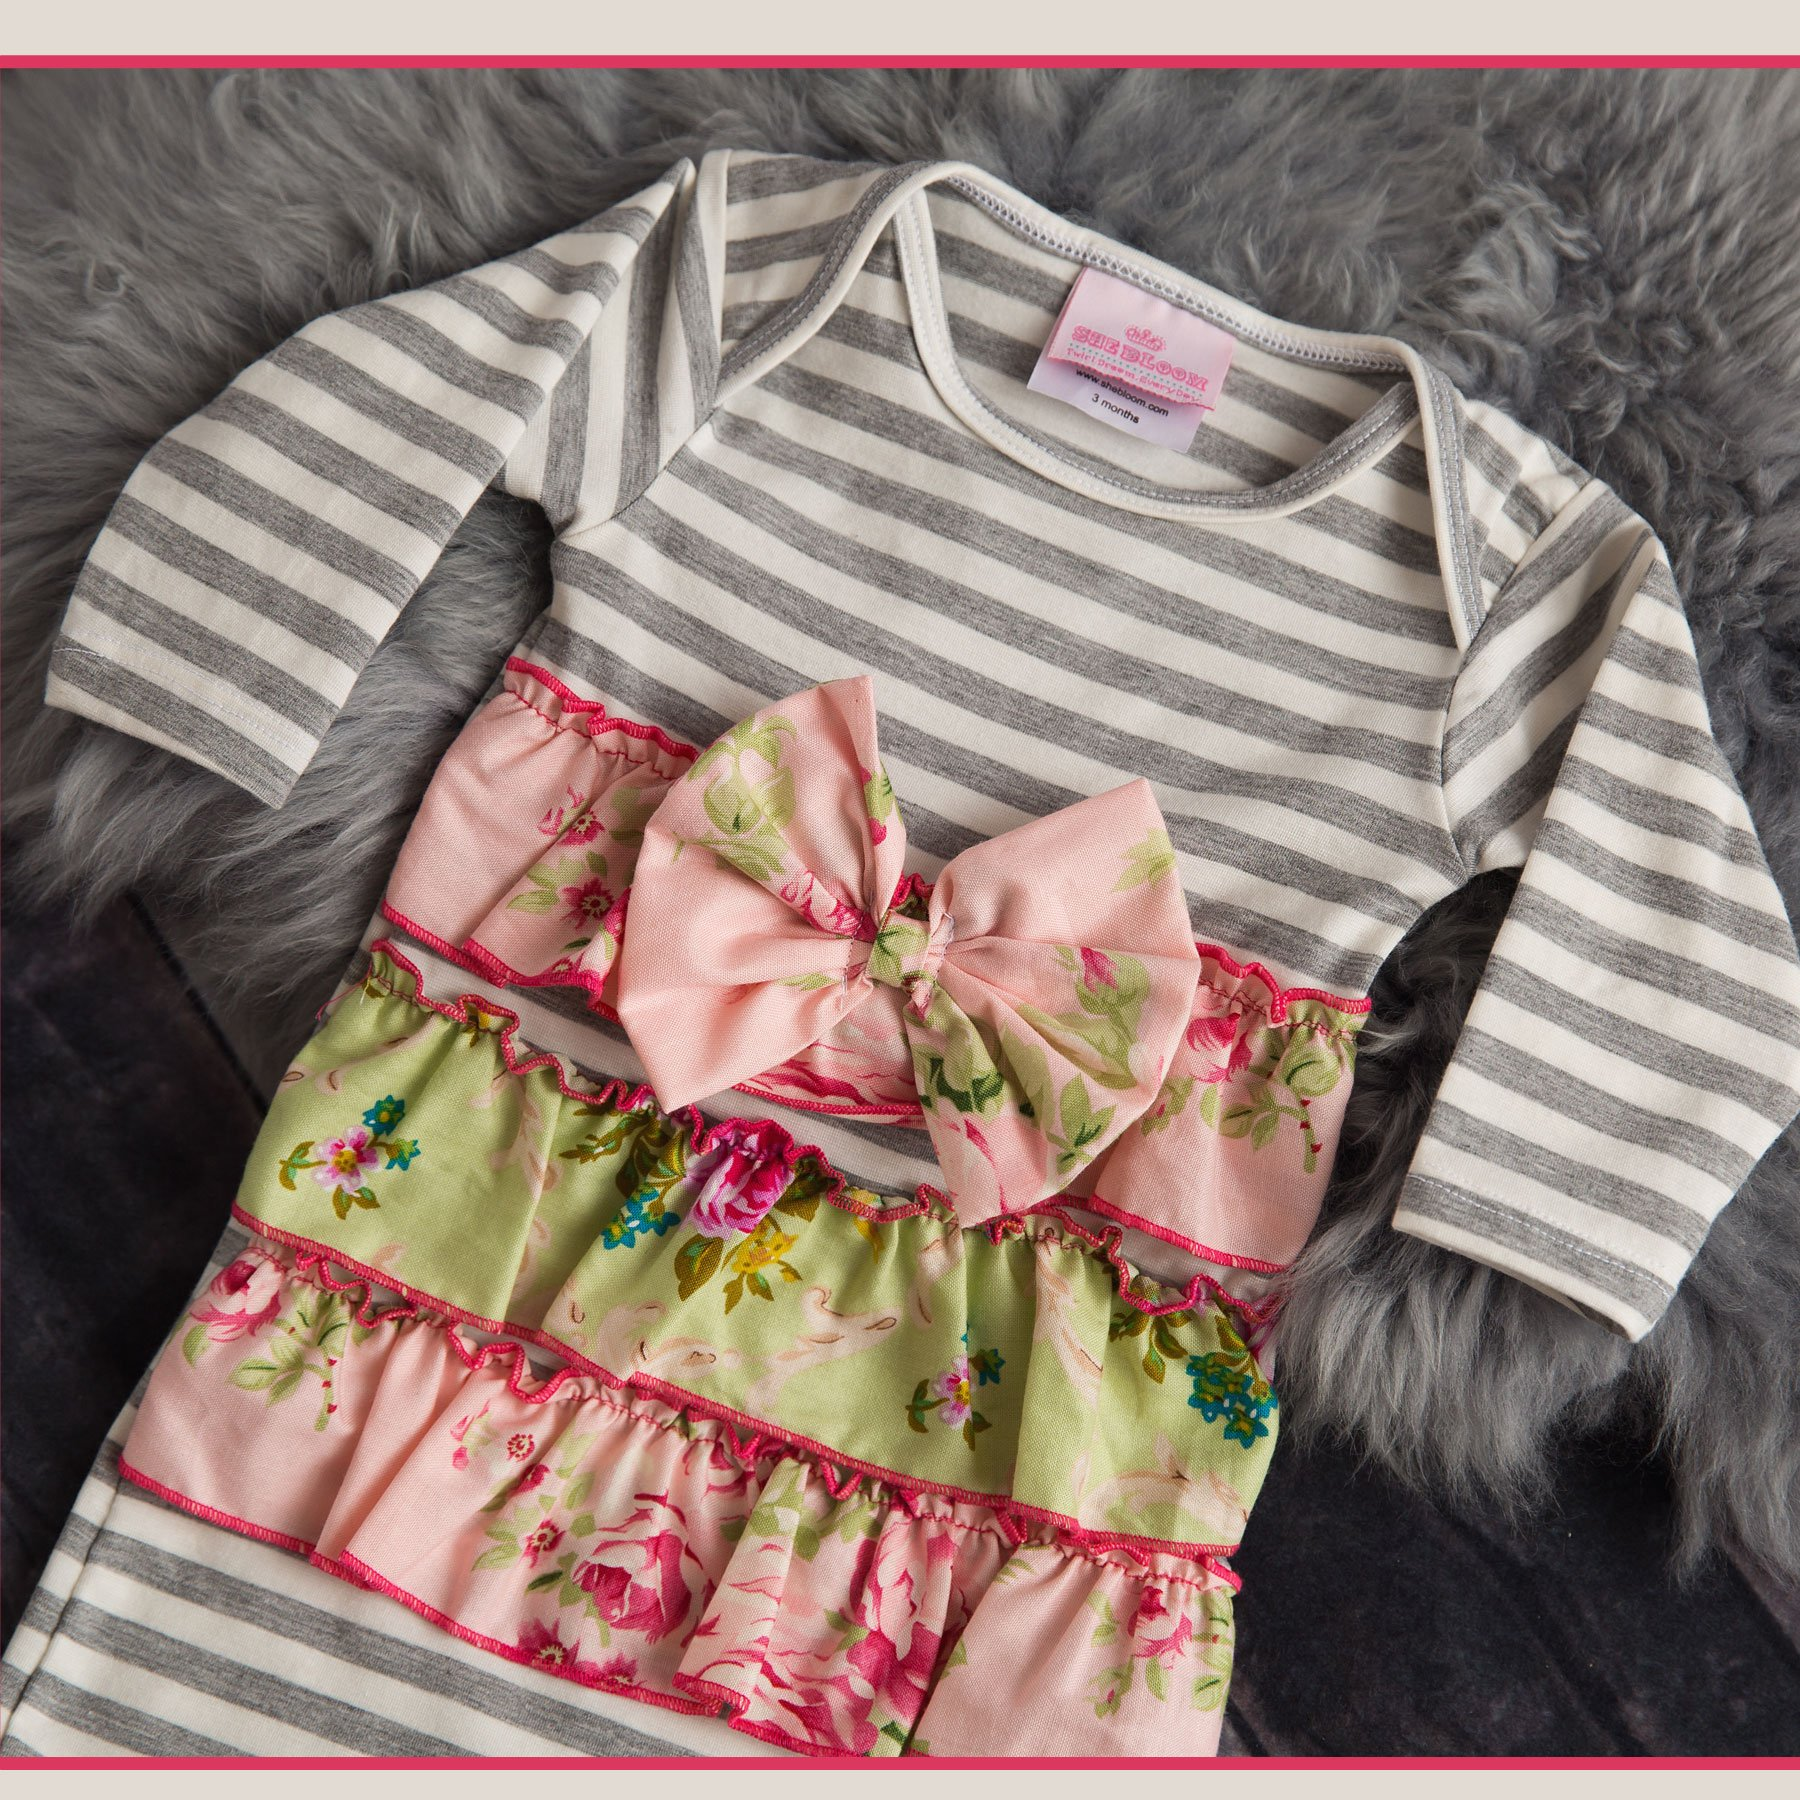 She Bloom Peggy Sage Newborn Gown